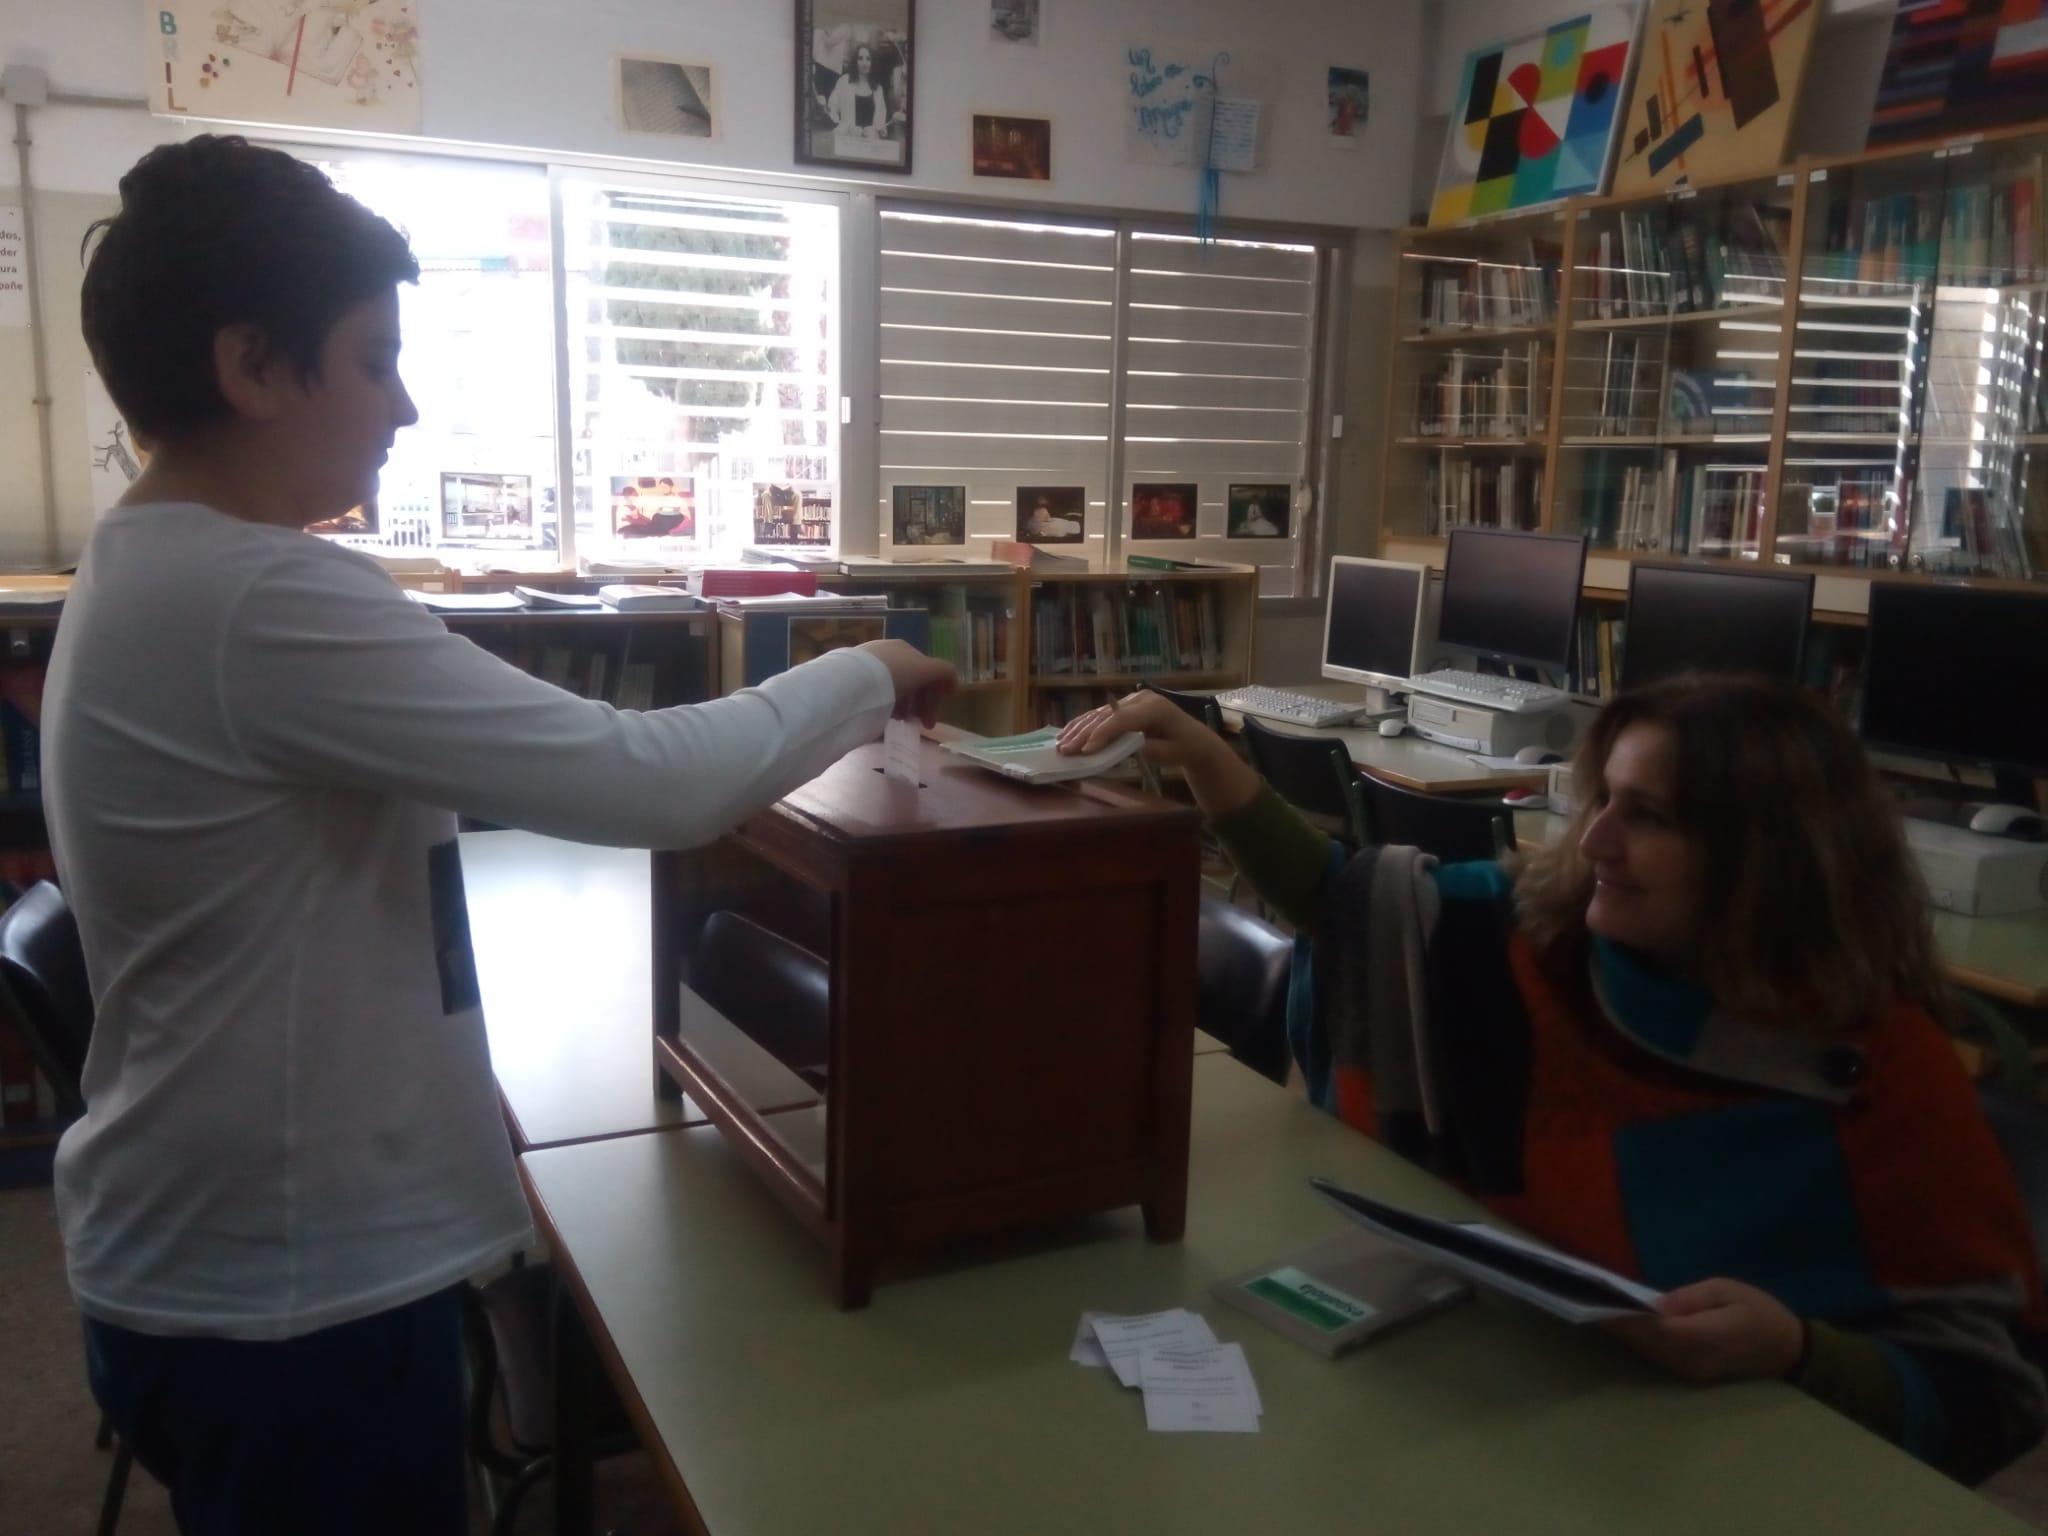 alumnos_votando1.jpg